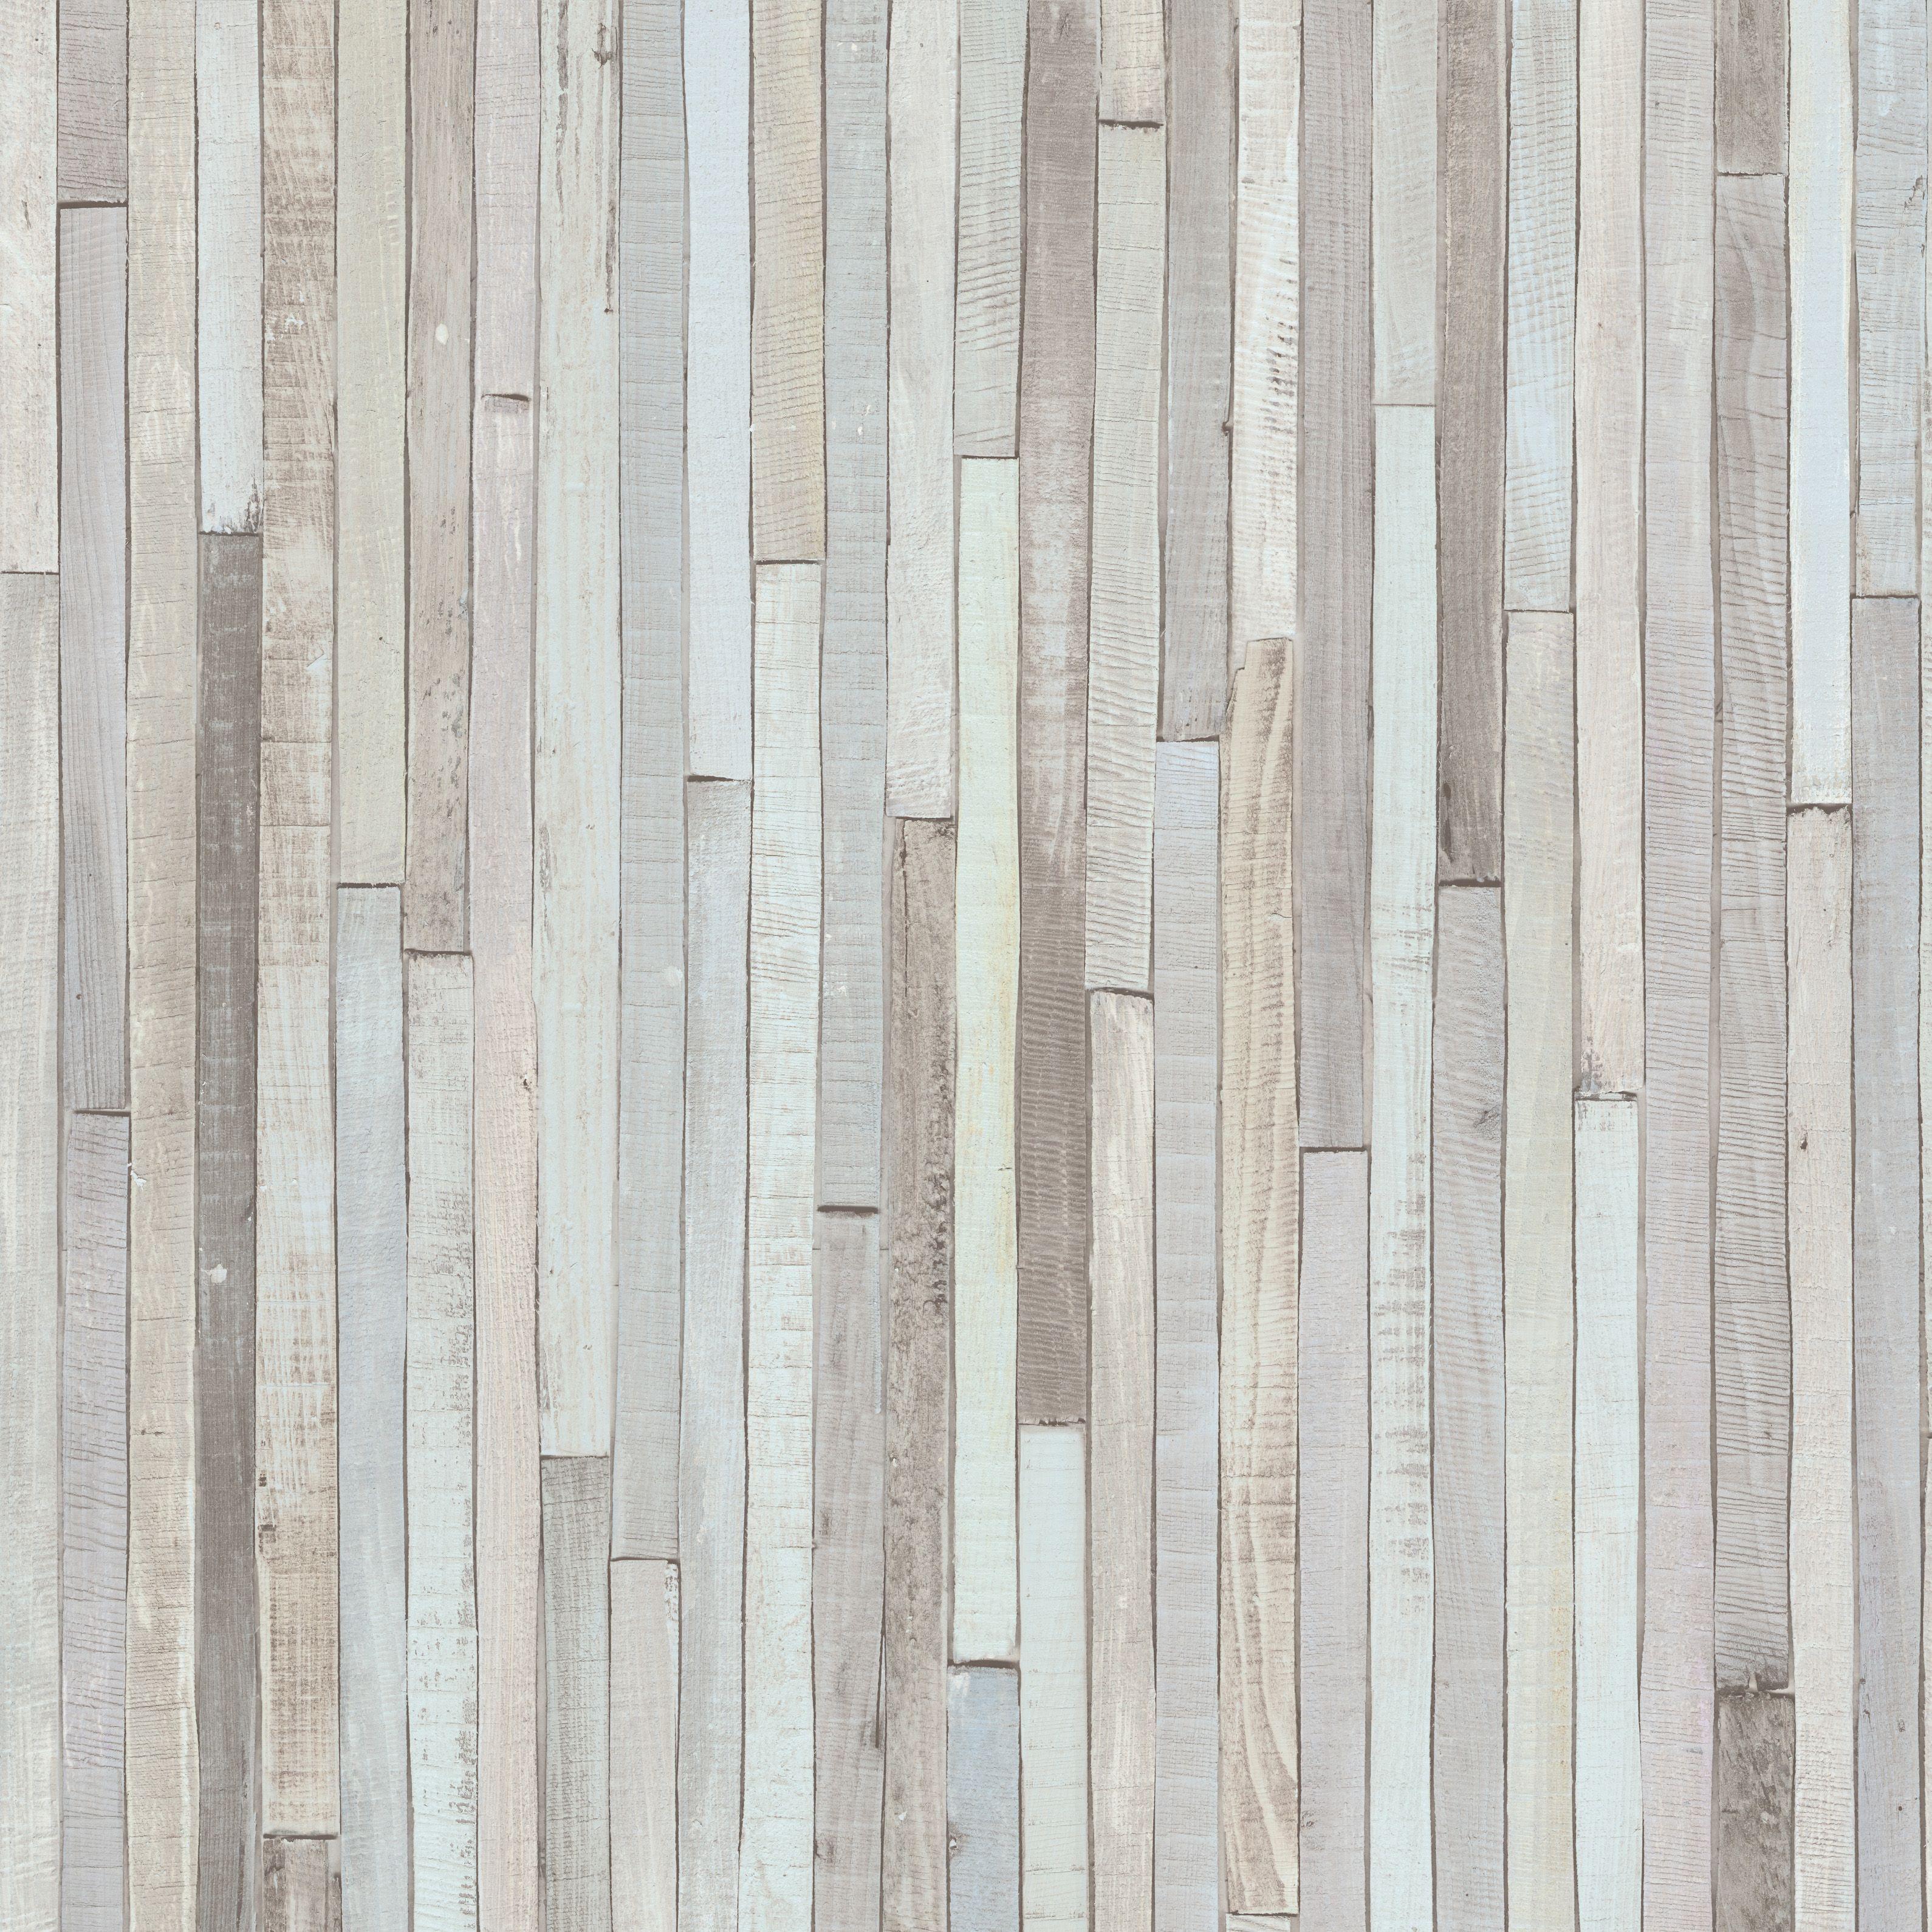 Rasch Cabin Wood Wallpaper   http   www godecorating co uk. Rasch Cabin Wood Wallpaper   http   www godecorating co uk rasch